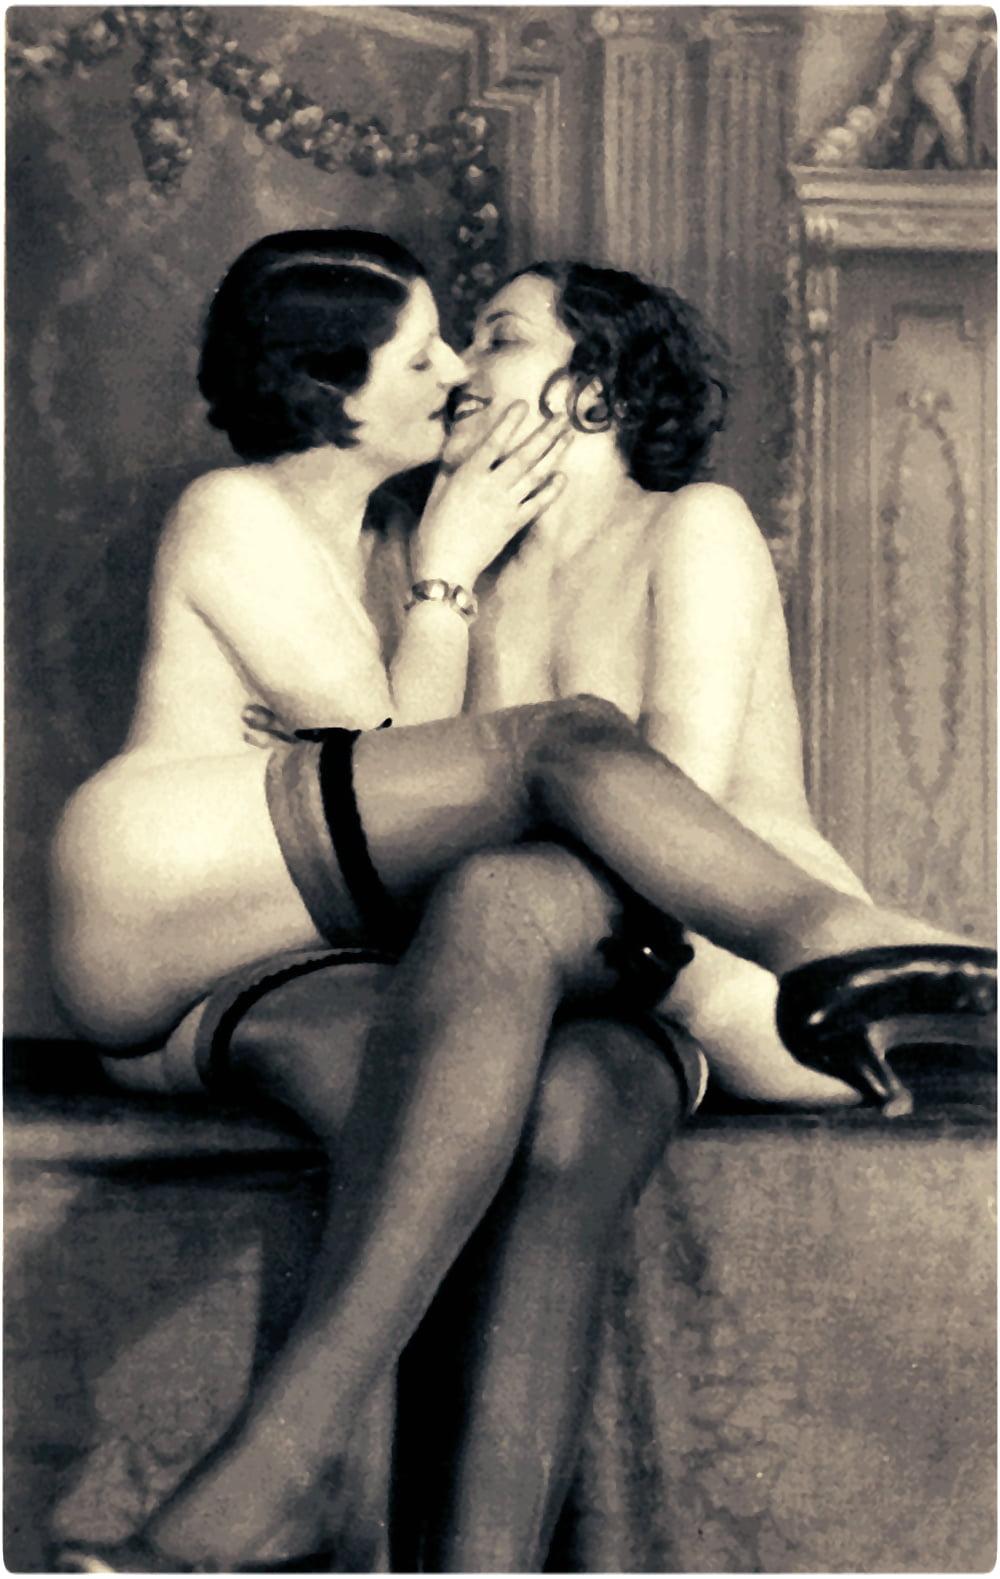 Vintagelesbians